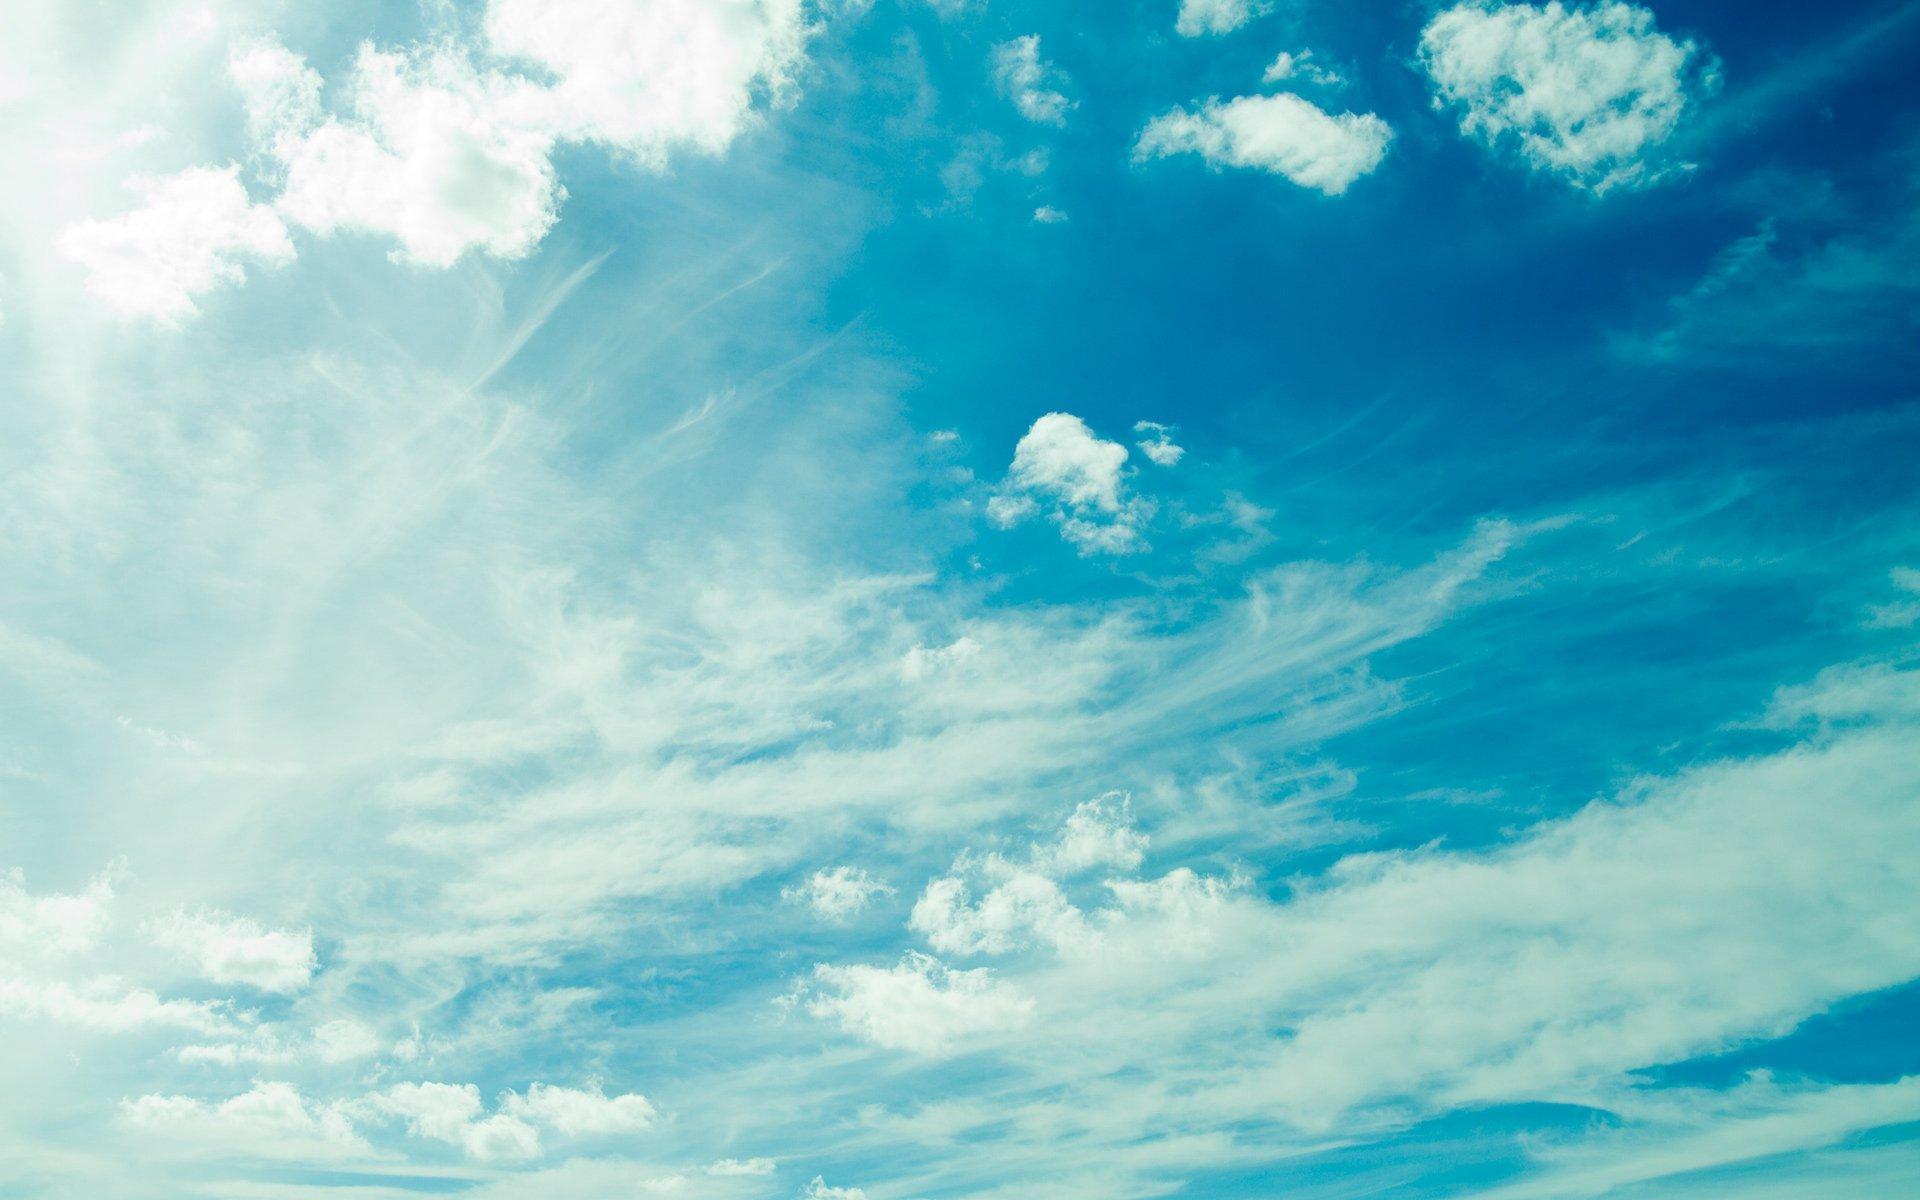 Fondos de pantalla Nubes maravillosas